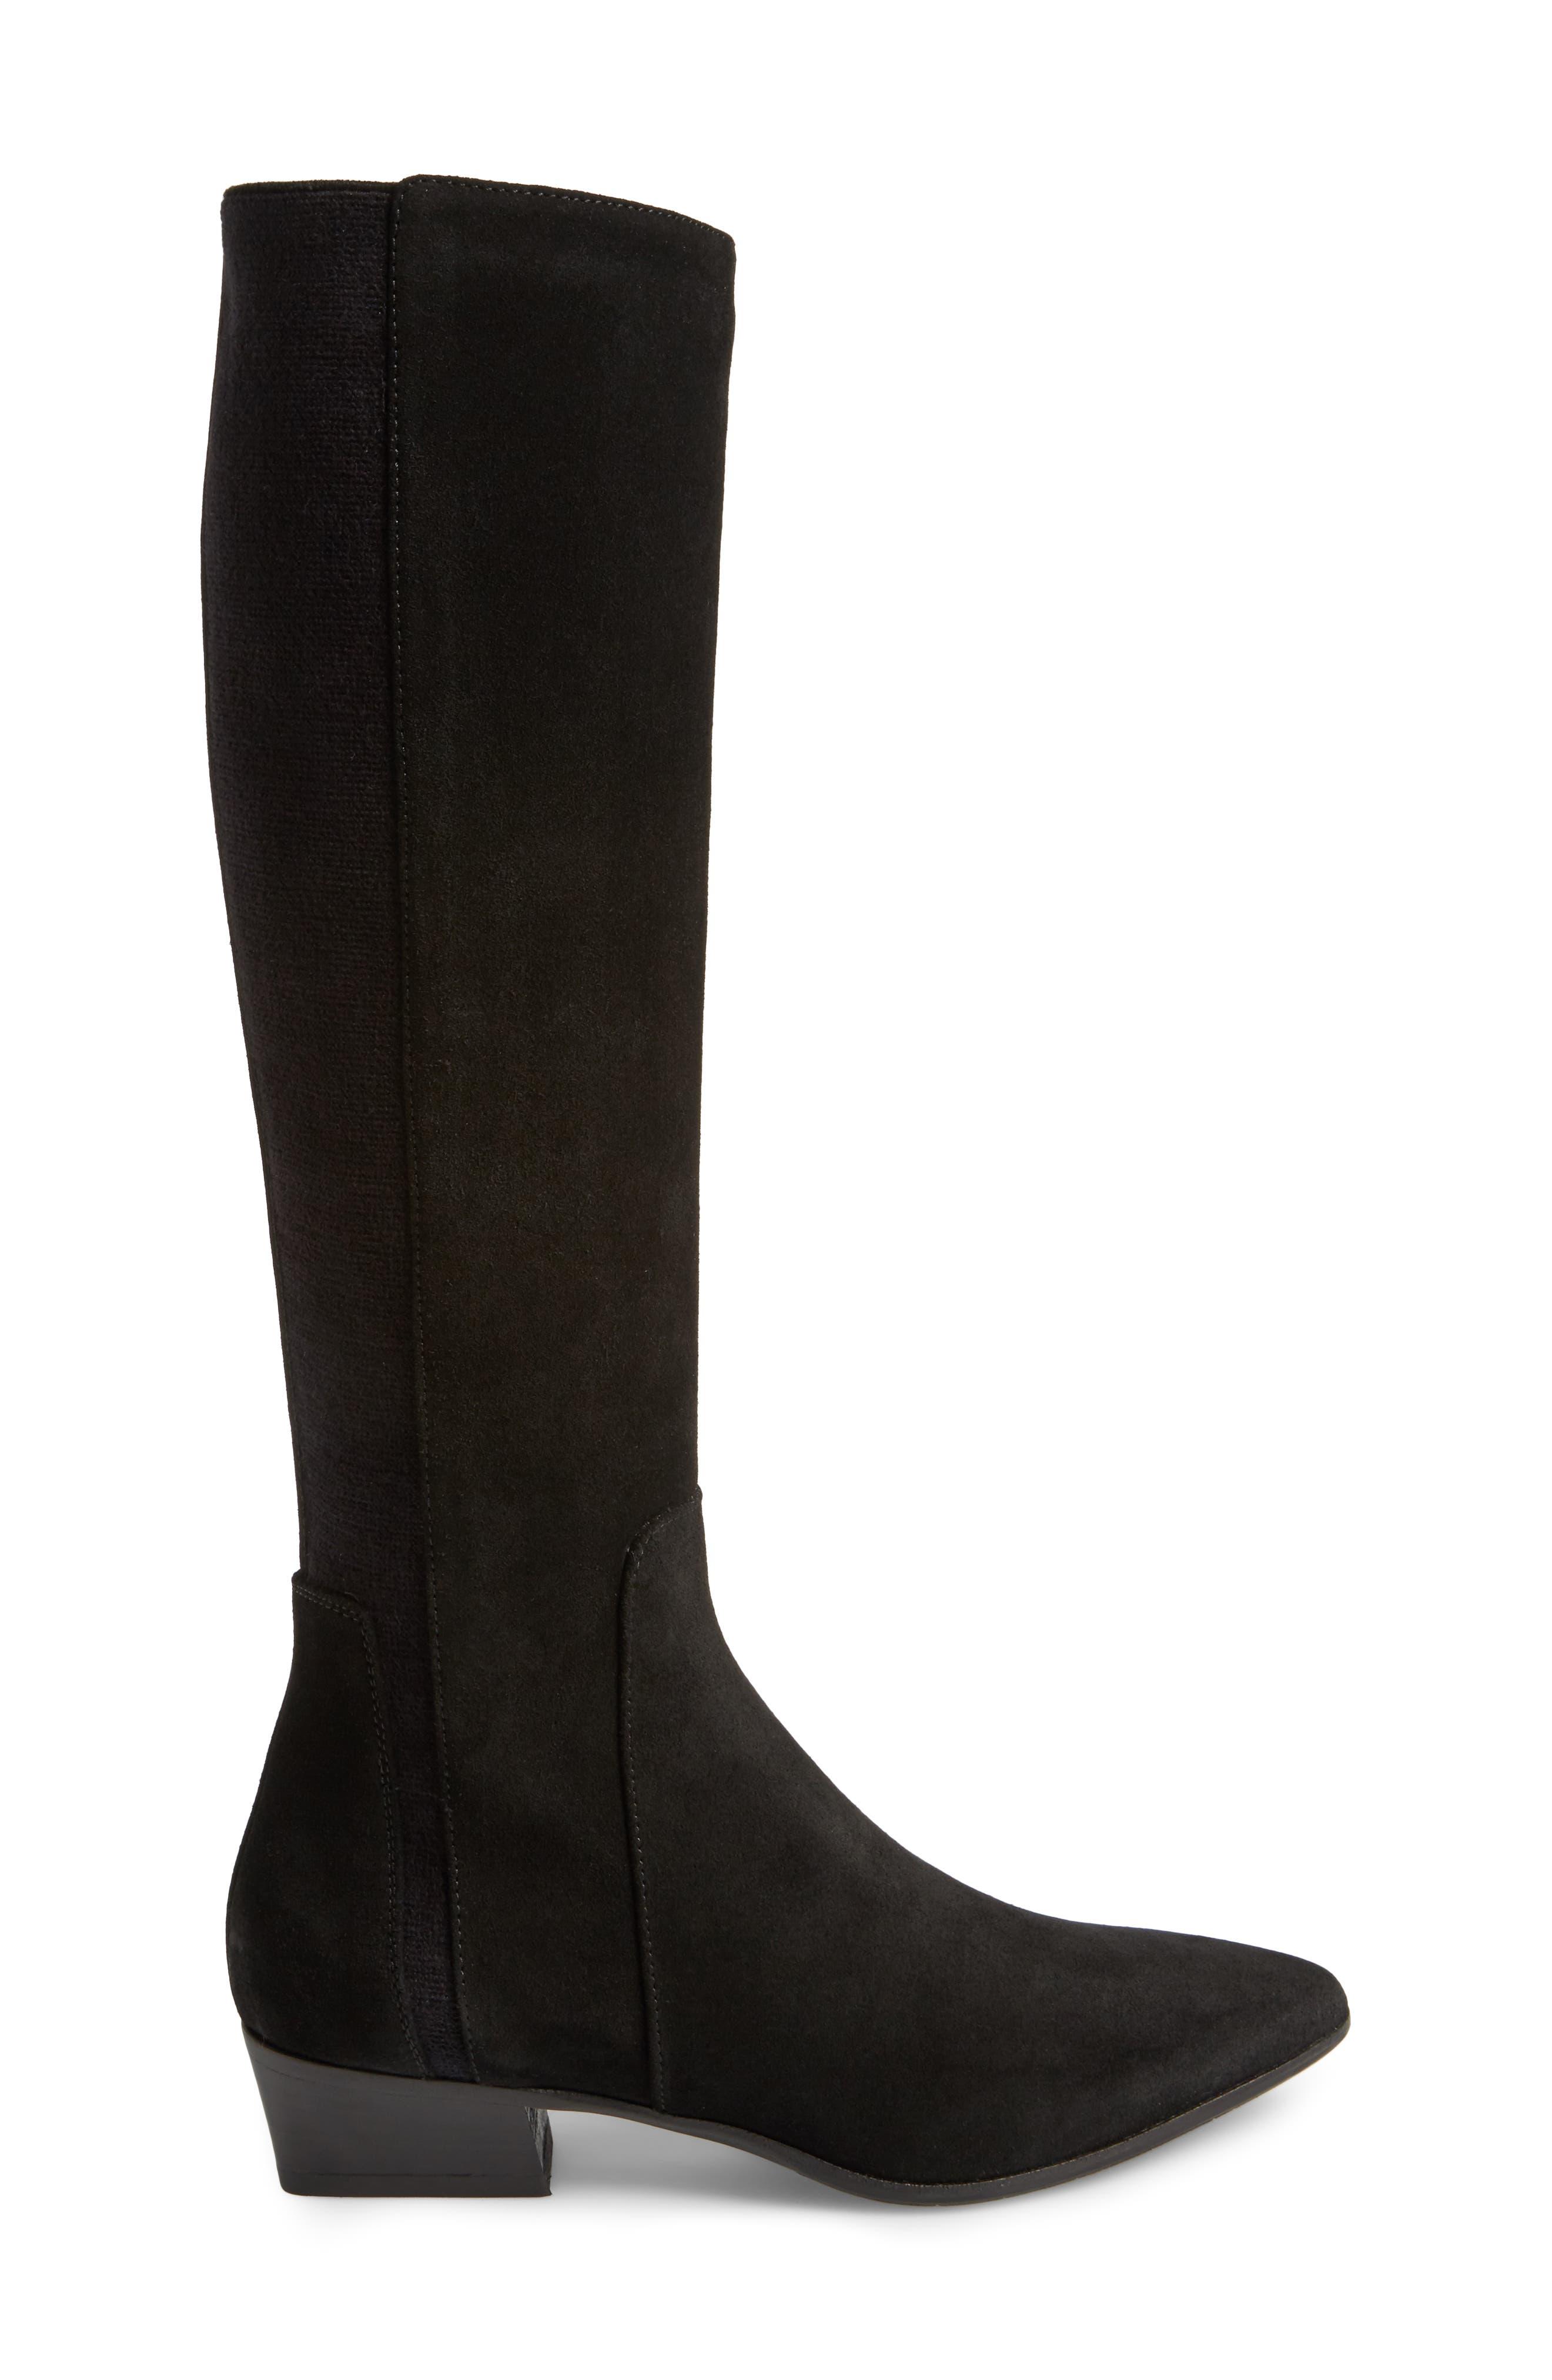 Federica Weatherproof Knee High Boot,                             Alternate thumbnail 3, color,                             001